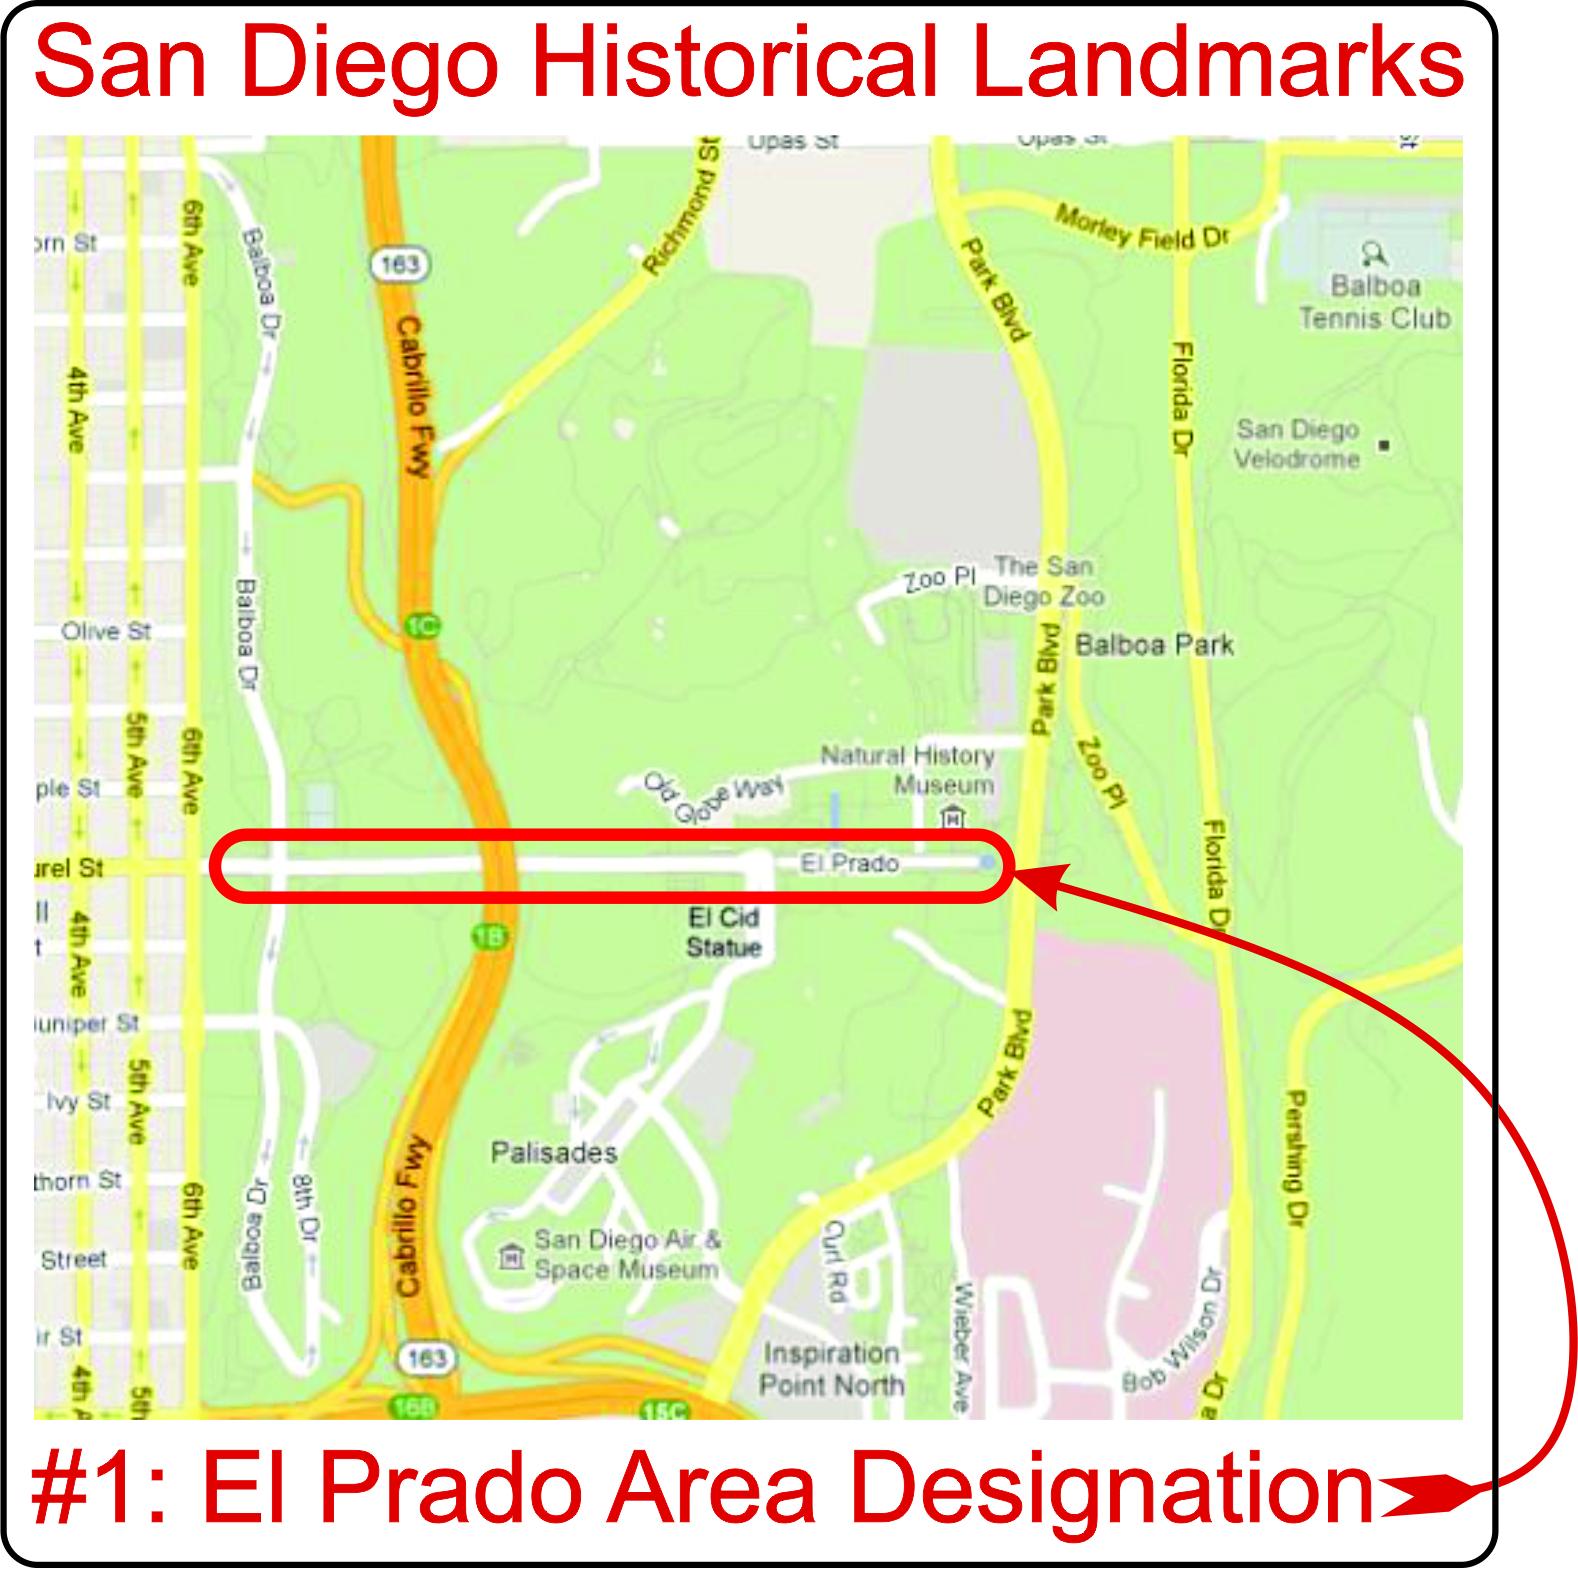 san diego historical landmarks 1 el prado area designation part 6 russel ray photos. Black Bedroom Furniture Sets. Home Design Ideas